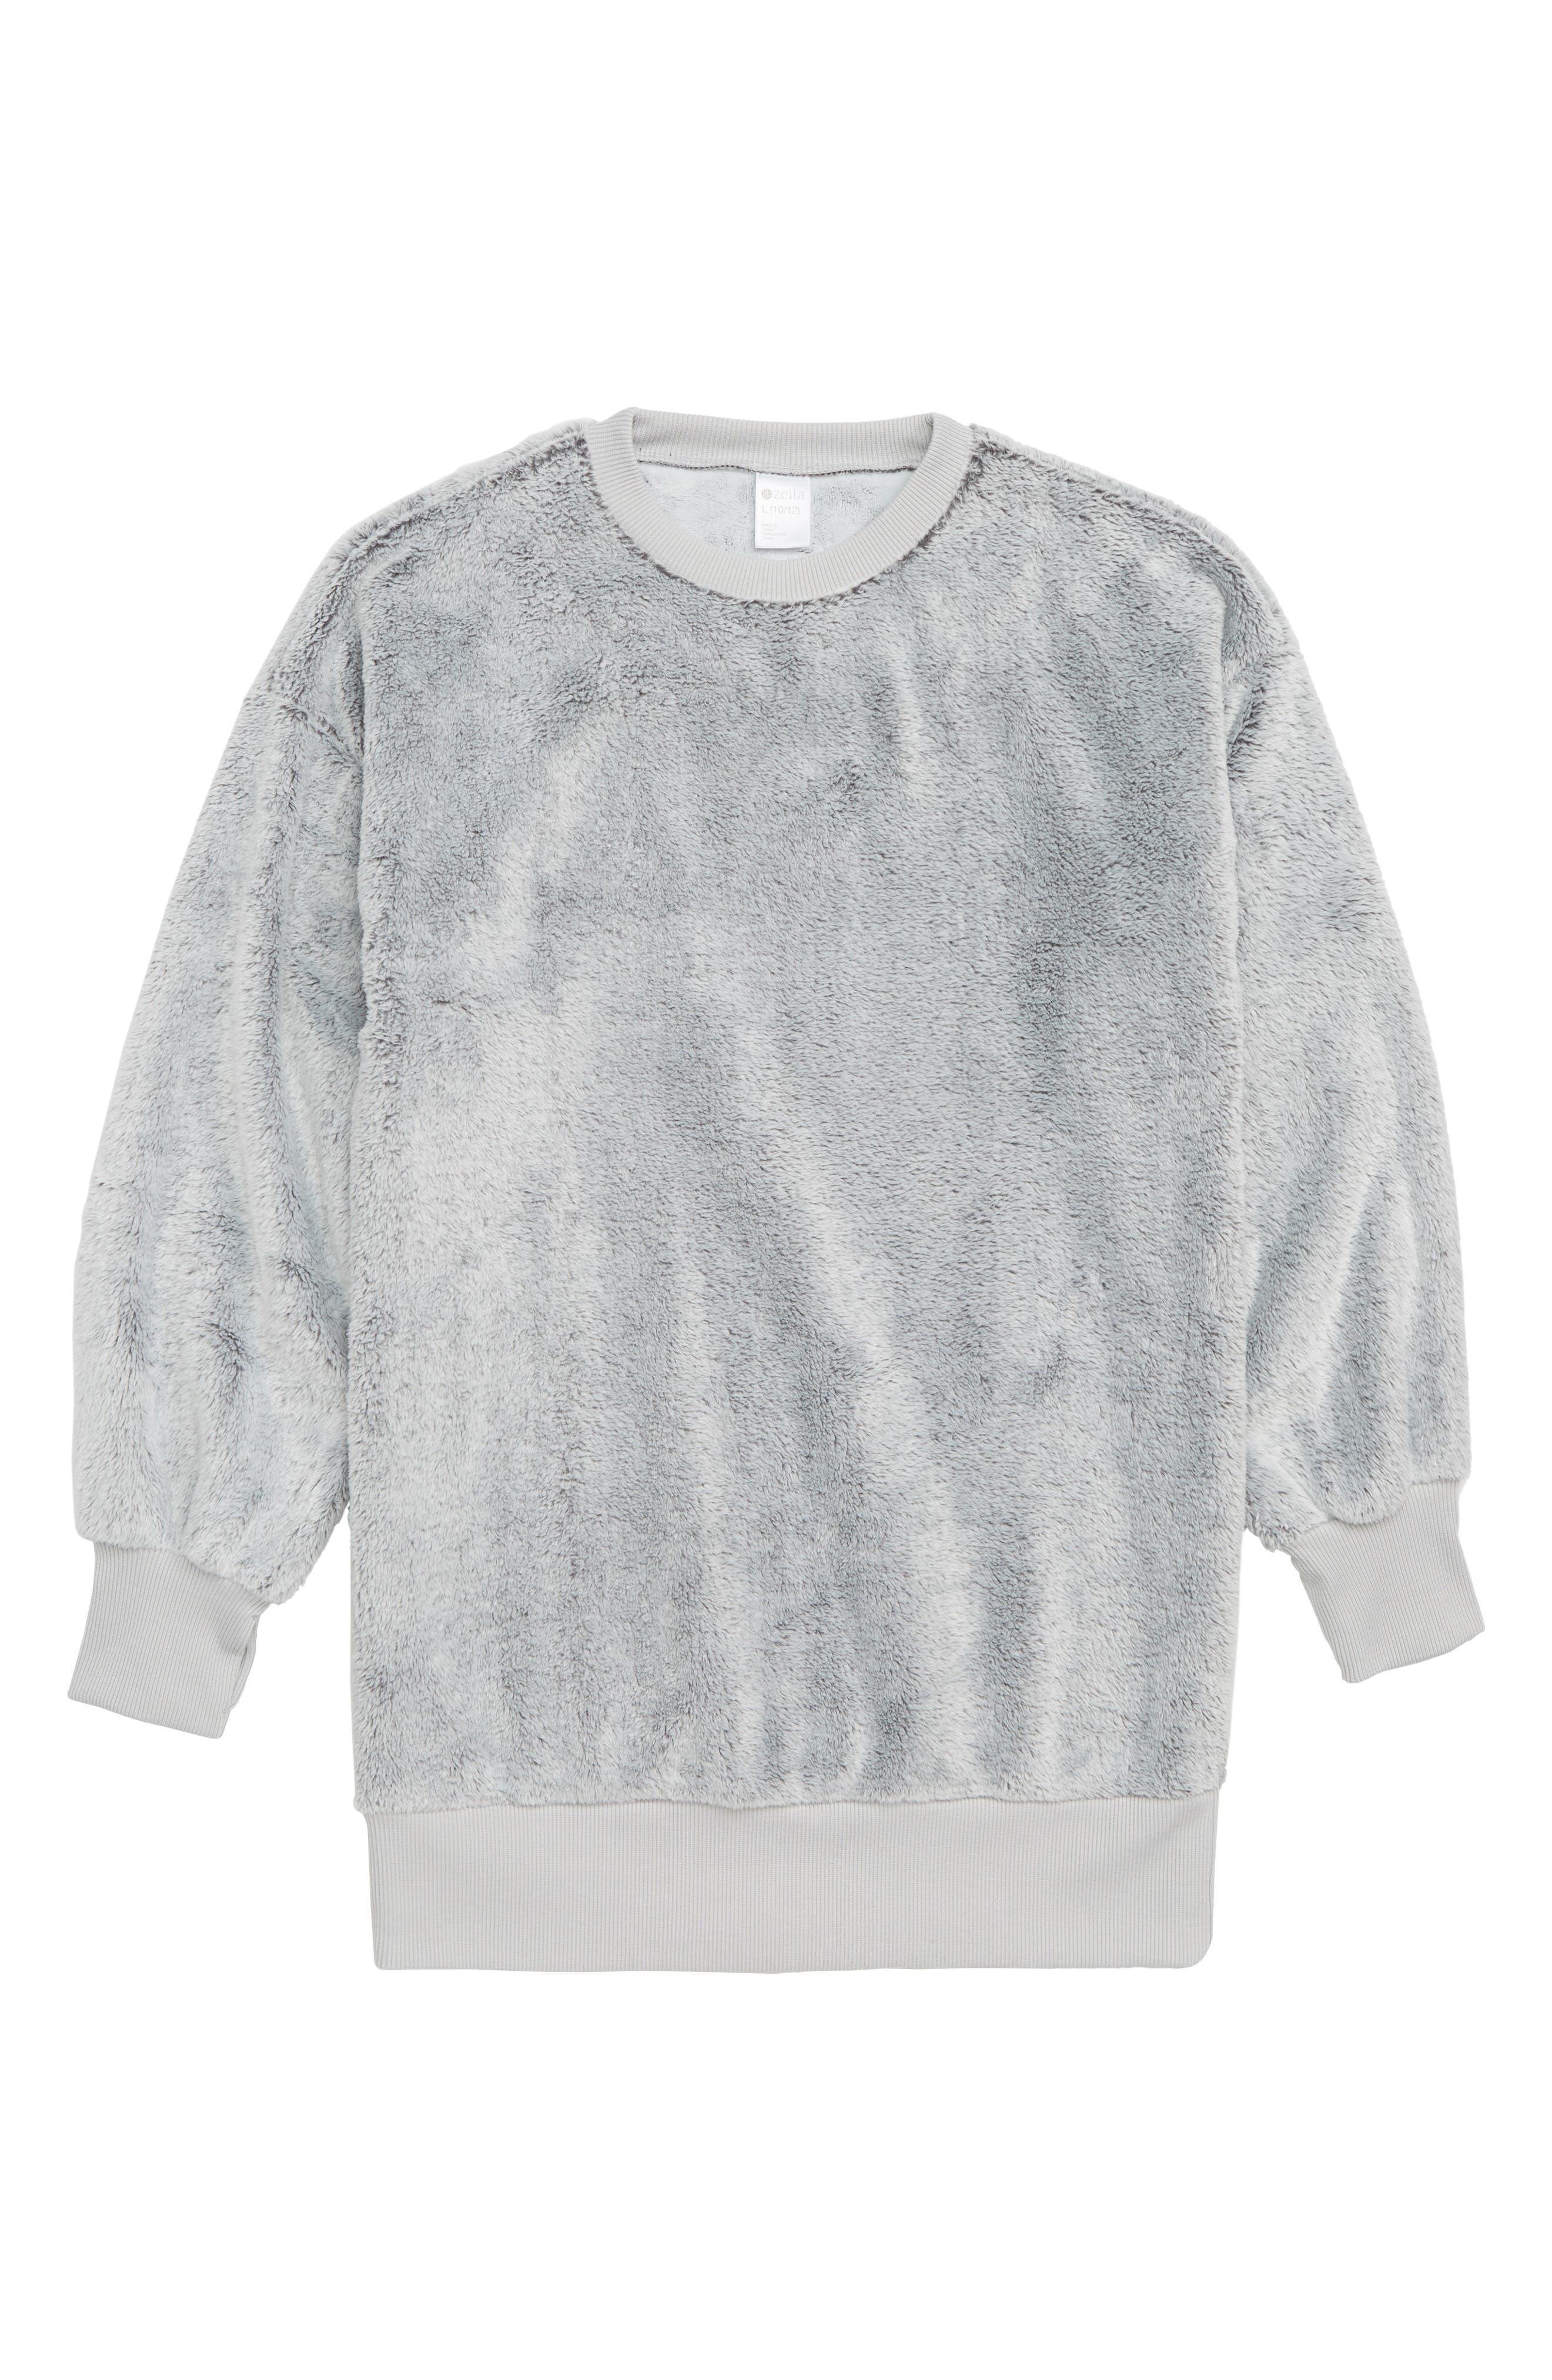 ZELLA GIRL Faux Fur Tunic Top, Main, color, 030